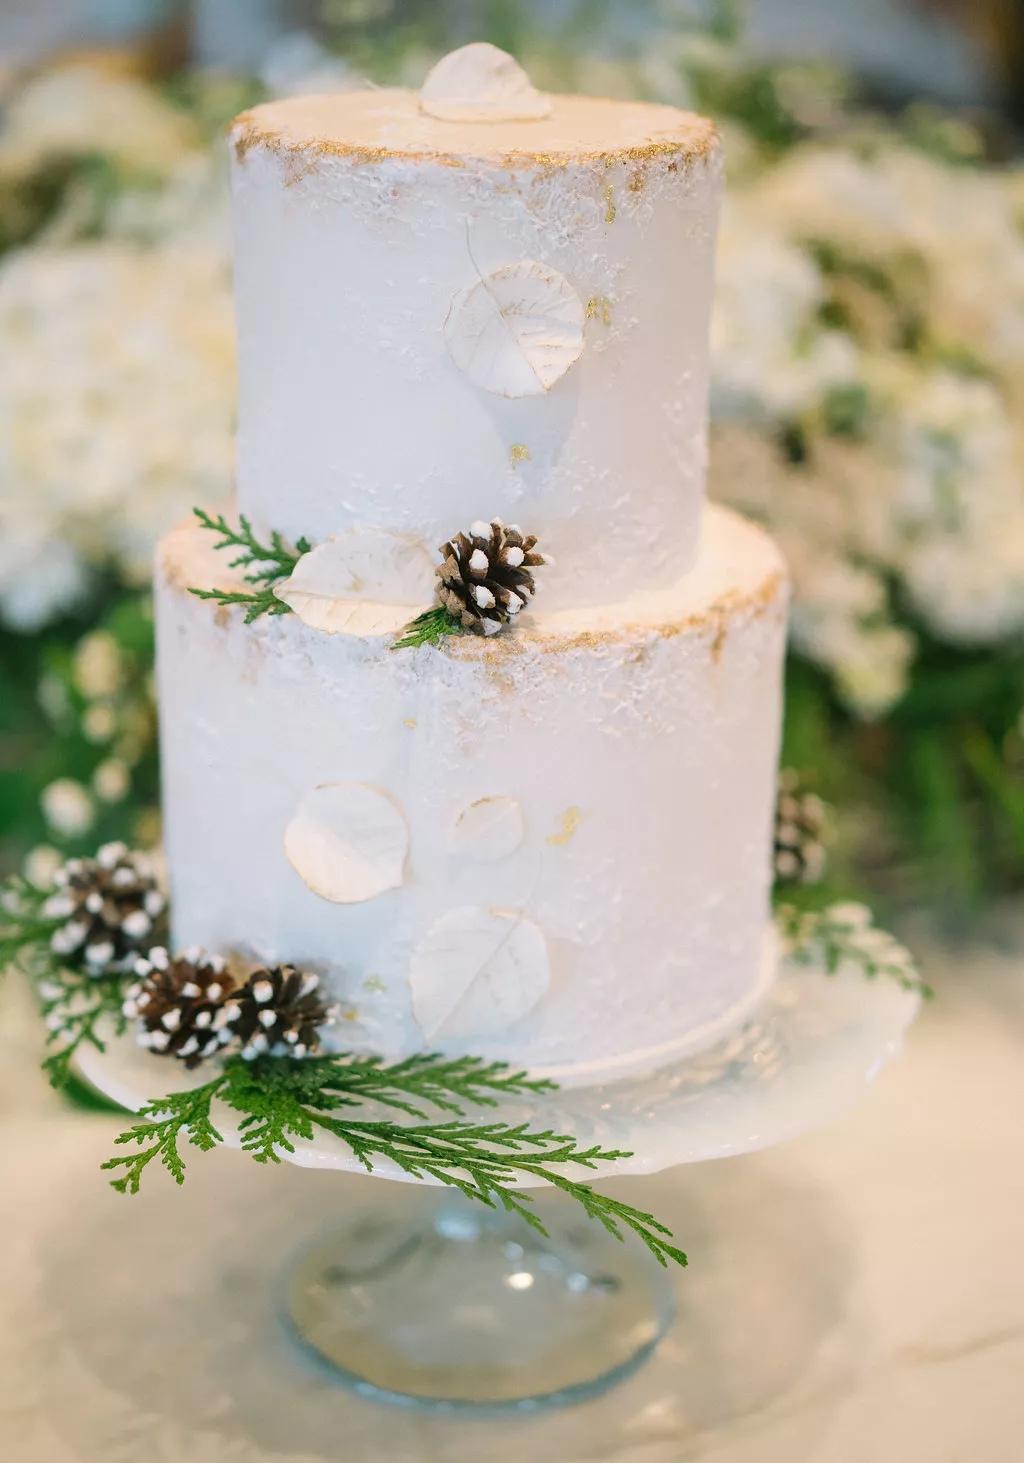 BomO9qQJPNo - Свадьба в зимнем стиле